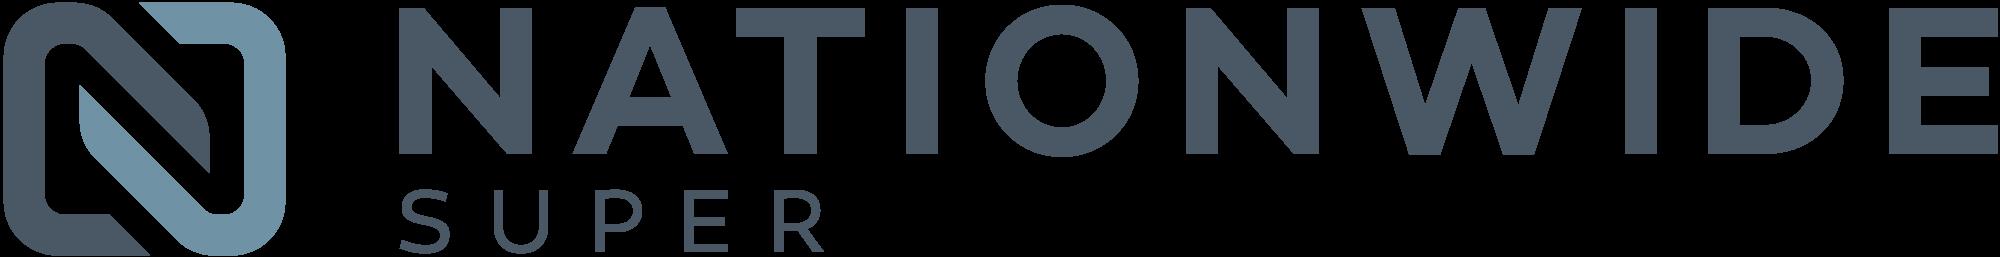 nationwidesuper-logo-twocolour